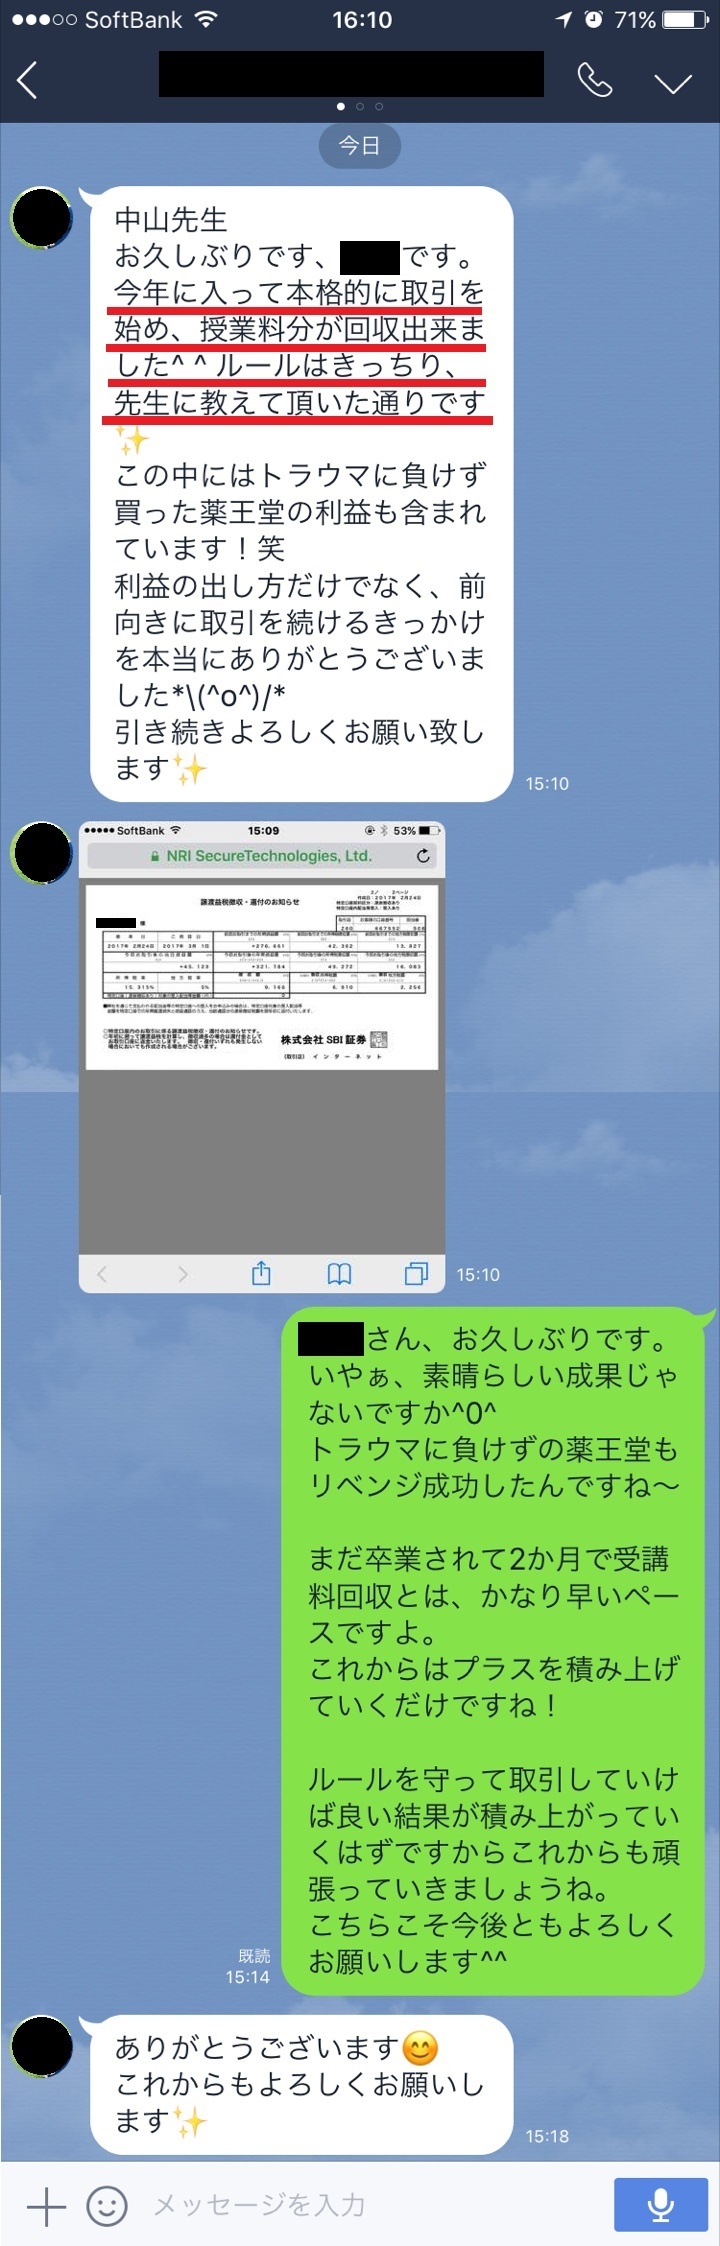 line69